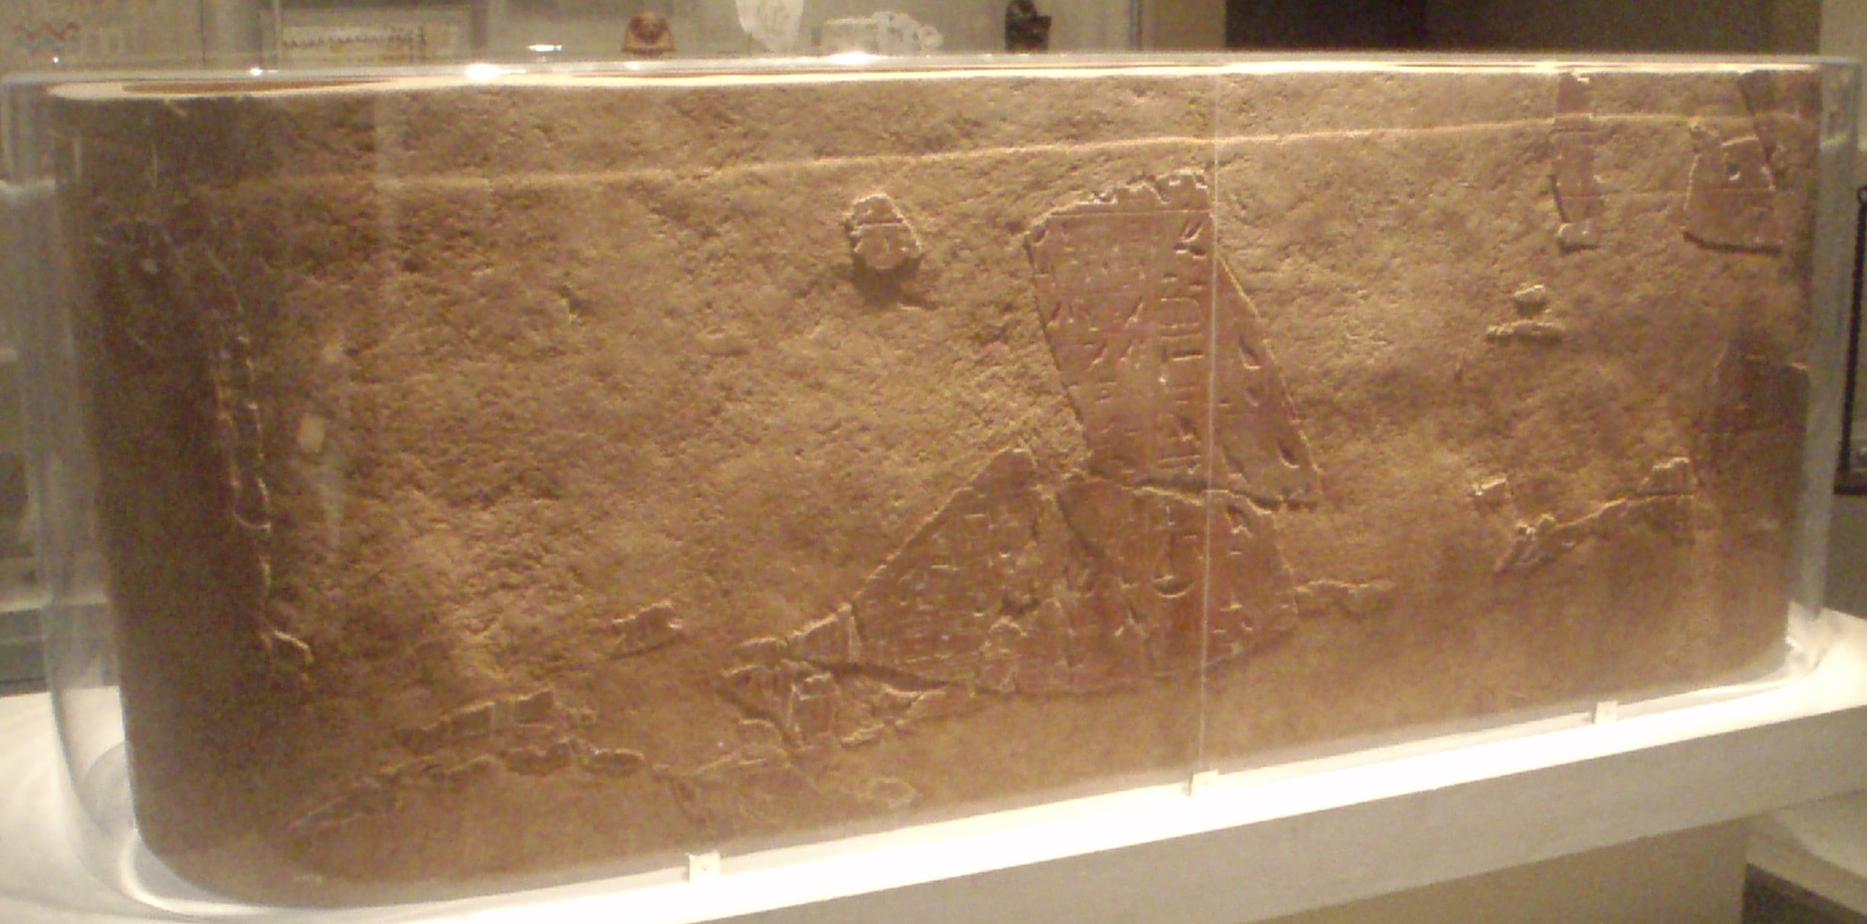 Senenmeut  sarchophagus Senenmut-BrownQuartziteSarcophagus_MetropolitanMuseum